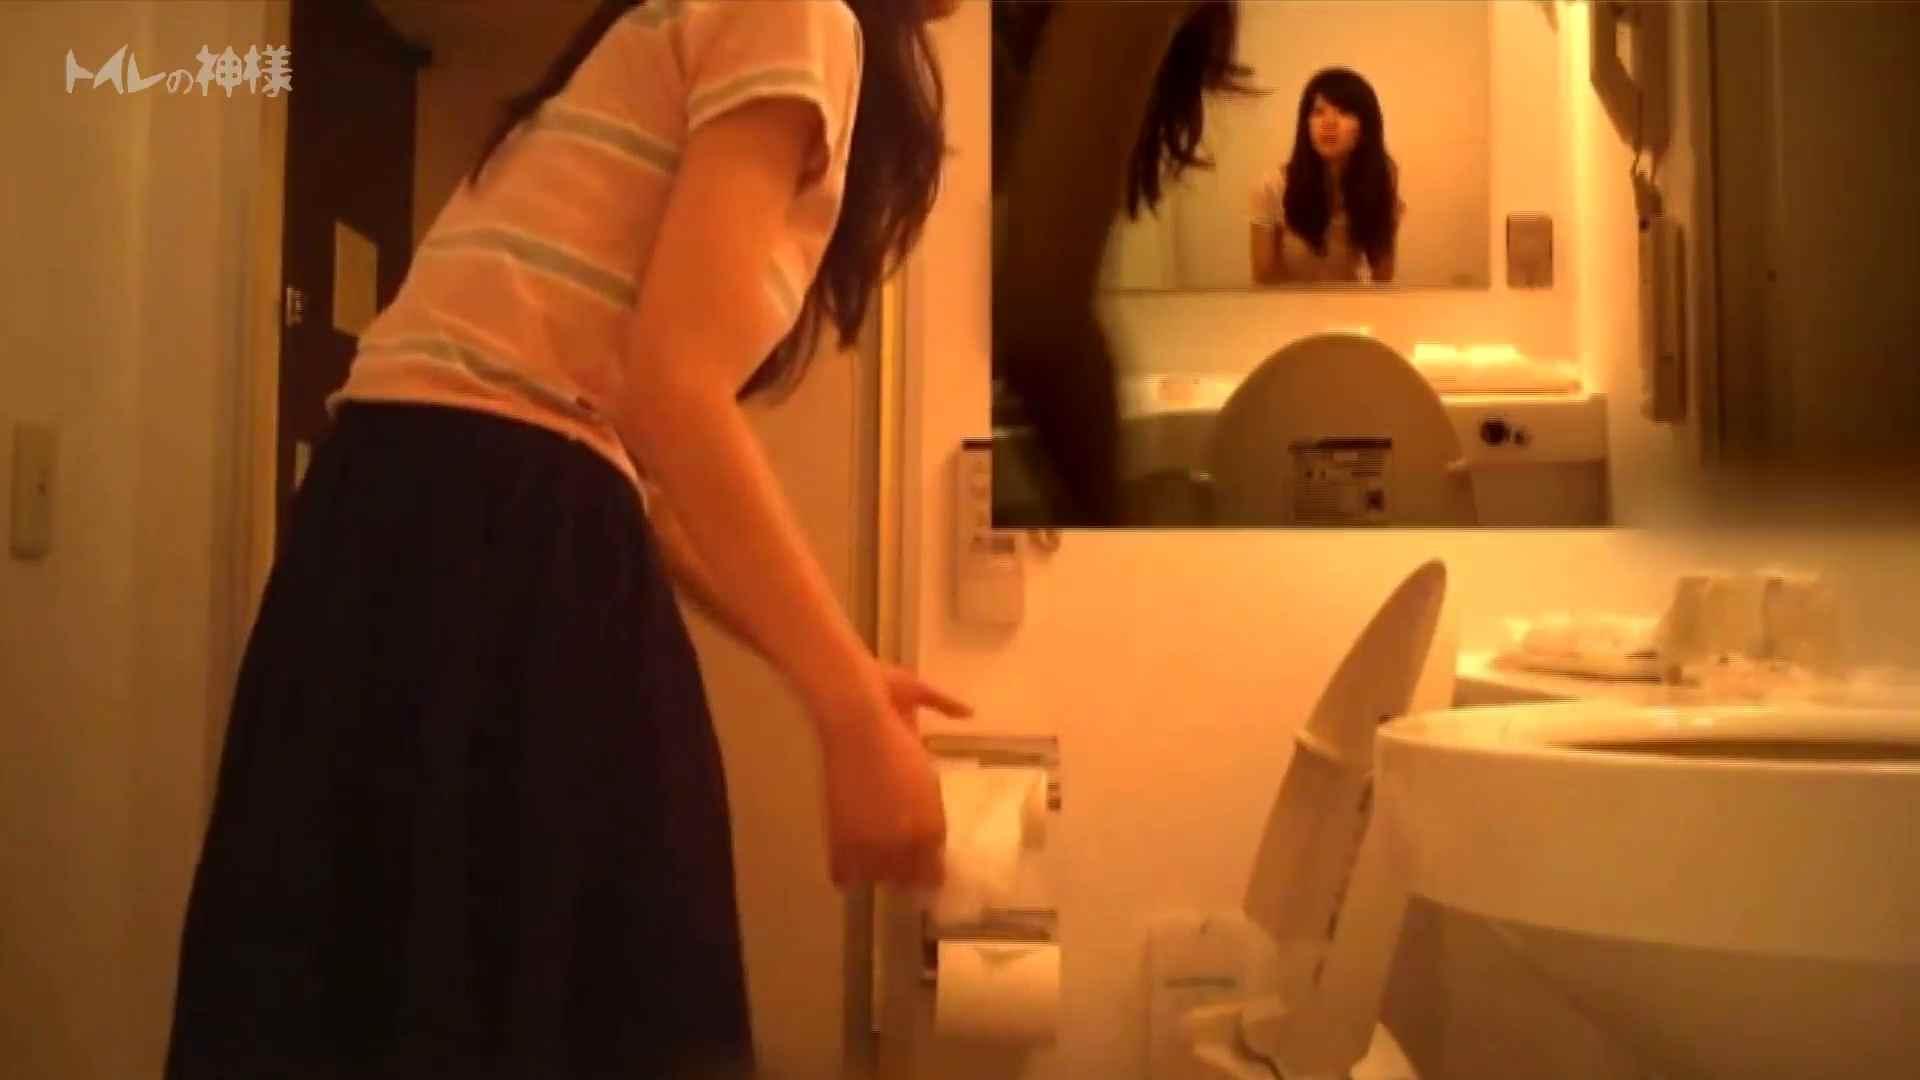 Vol.04 女子大生のトイレ恥態 女子大生 エロ無料画像 92枚 35